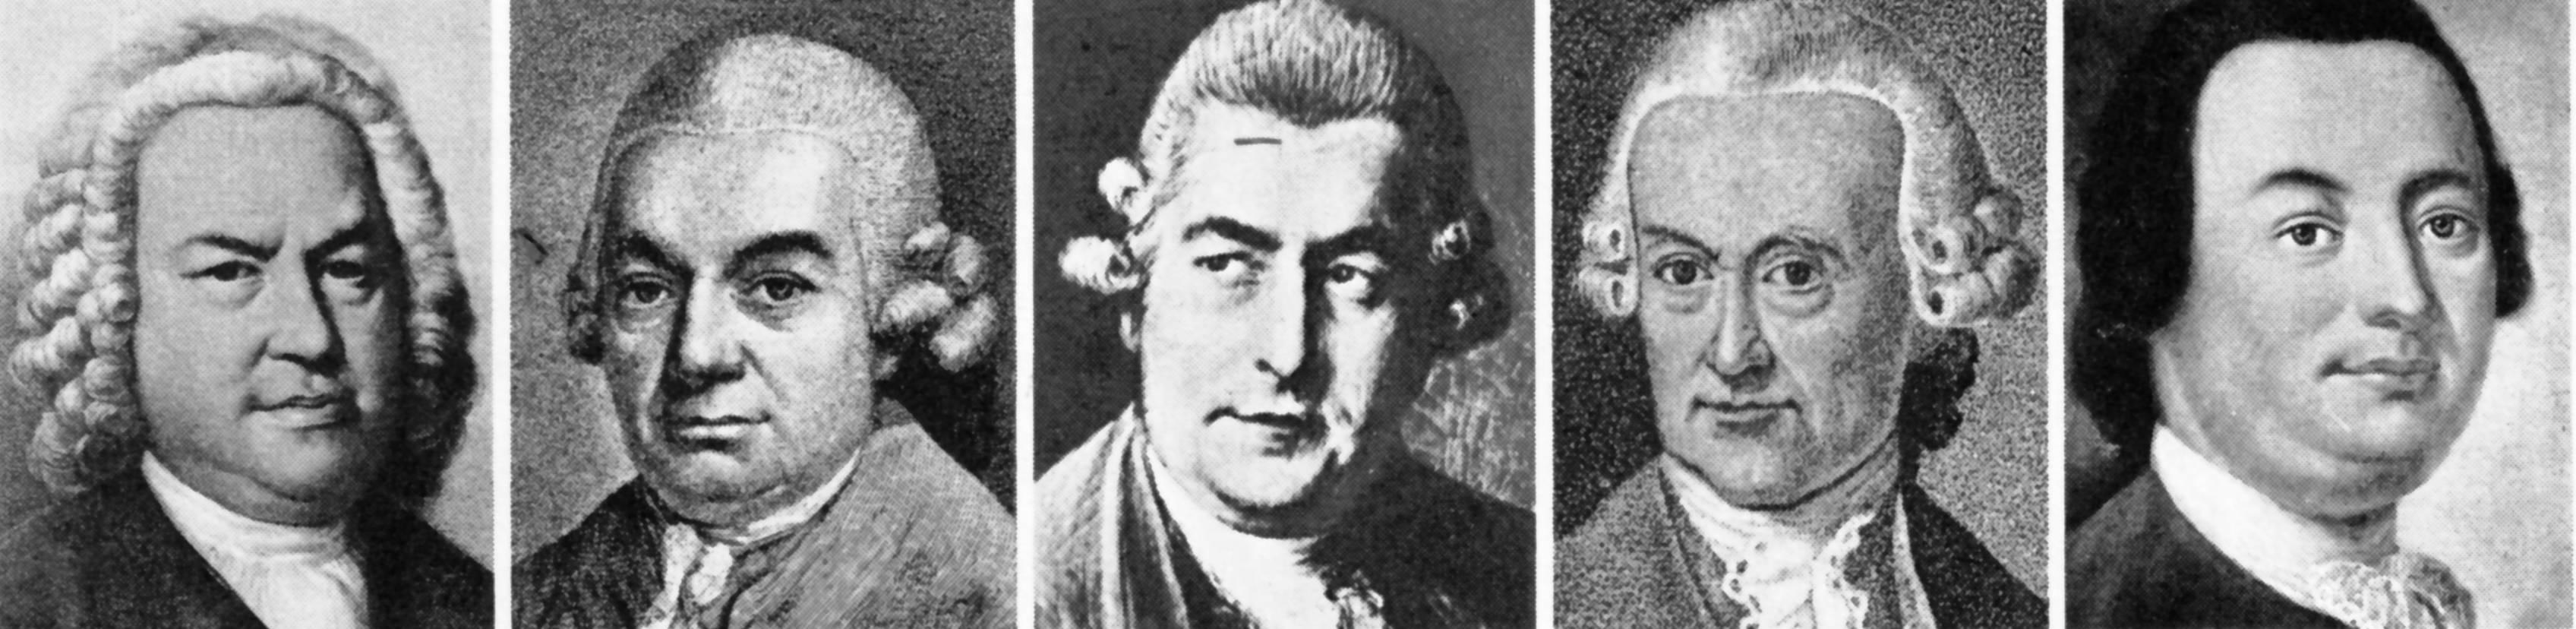 Description JohannSebastianBach1685-1750UndSoehne jpgJohann Sebastian Bach Family